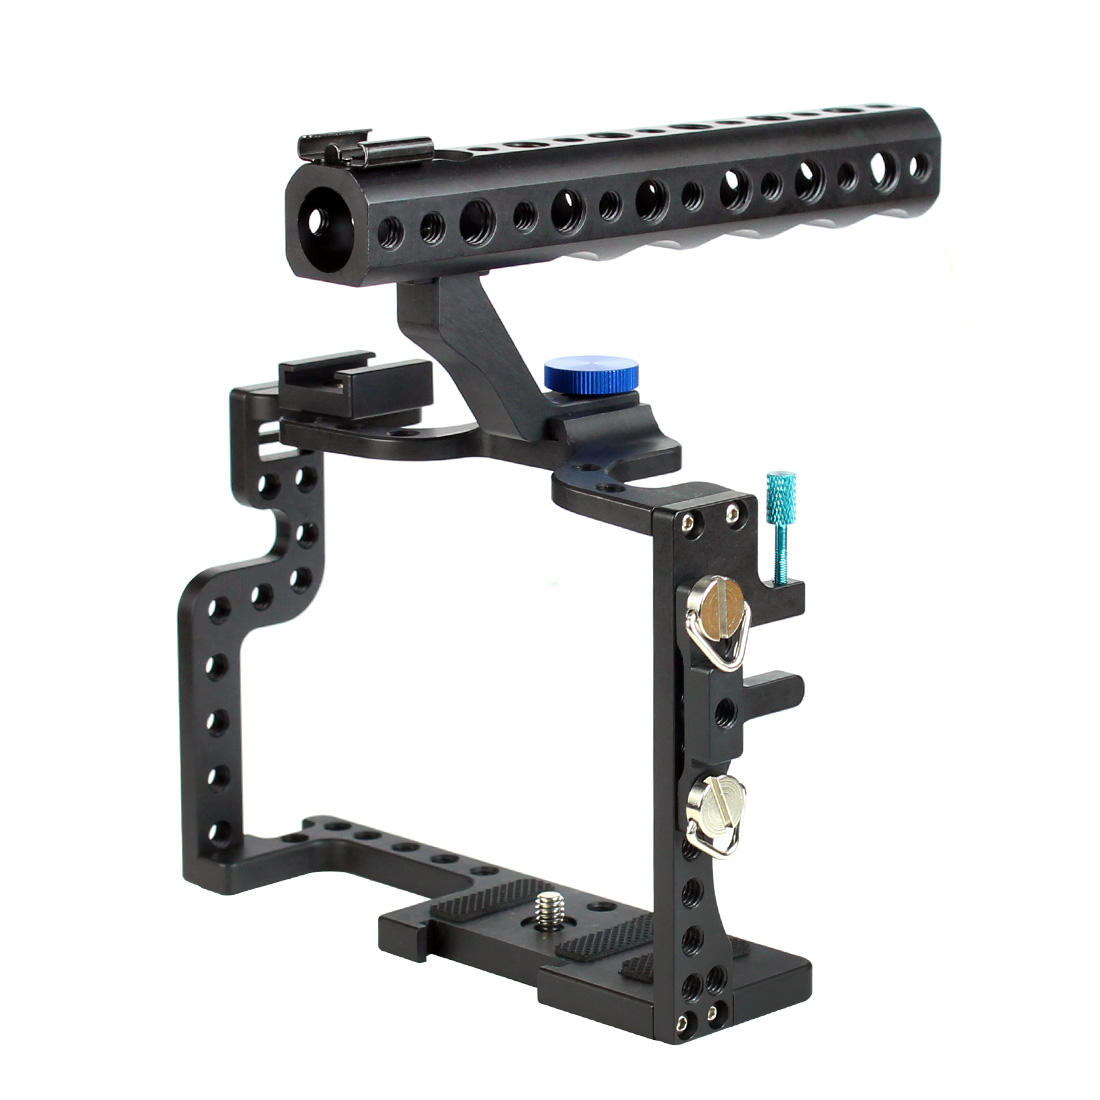 F11100 Profissional GH3 GH4 Protective Case Habitação Pega Kit Combo Robusto Gaiola Bandeja Monte Rig DSLR Câmera Digital